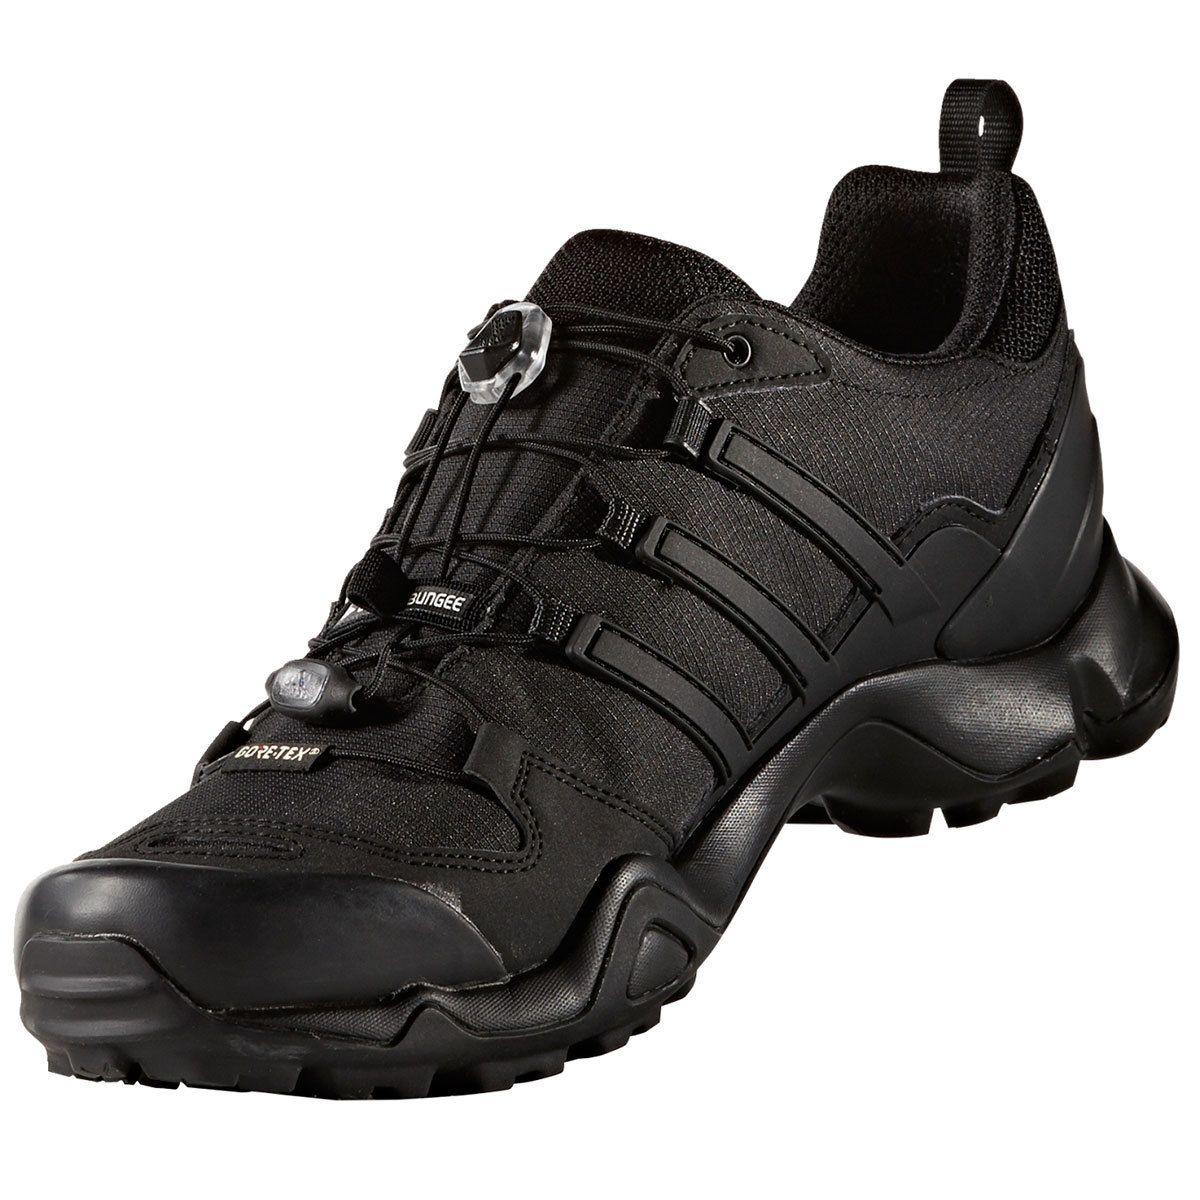 adidas Men's Terrex Swift R GTX Hiking Shoes